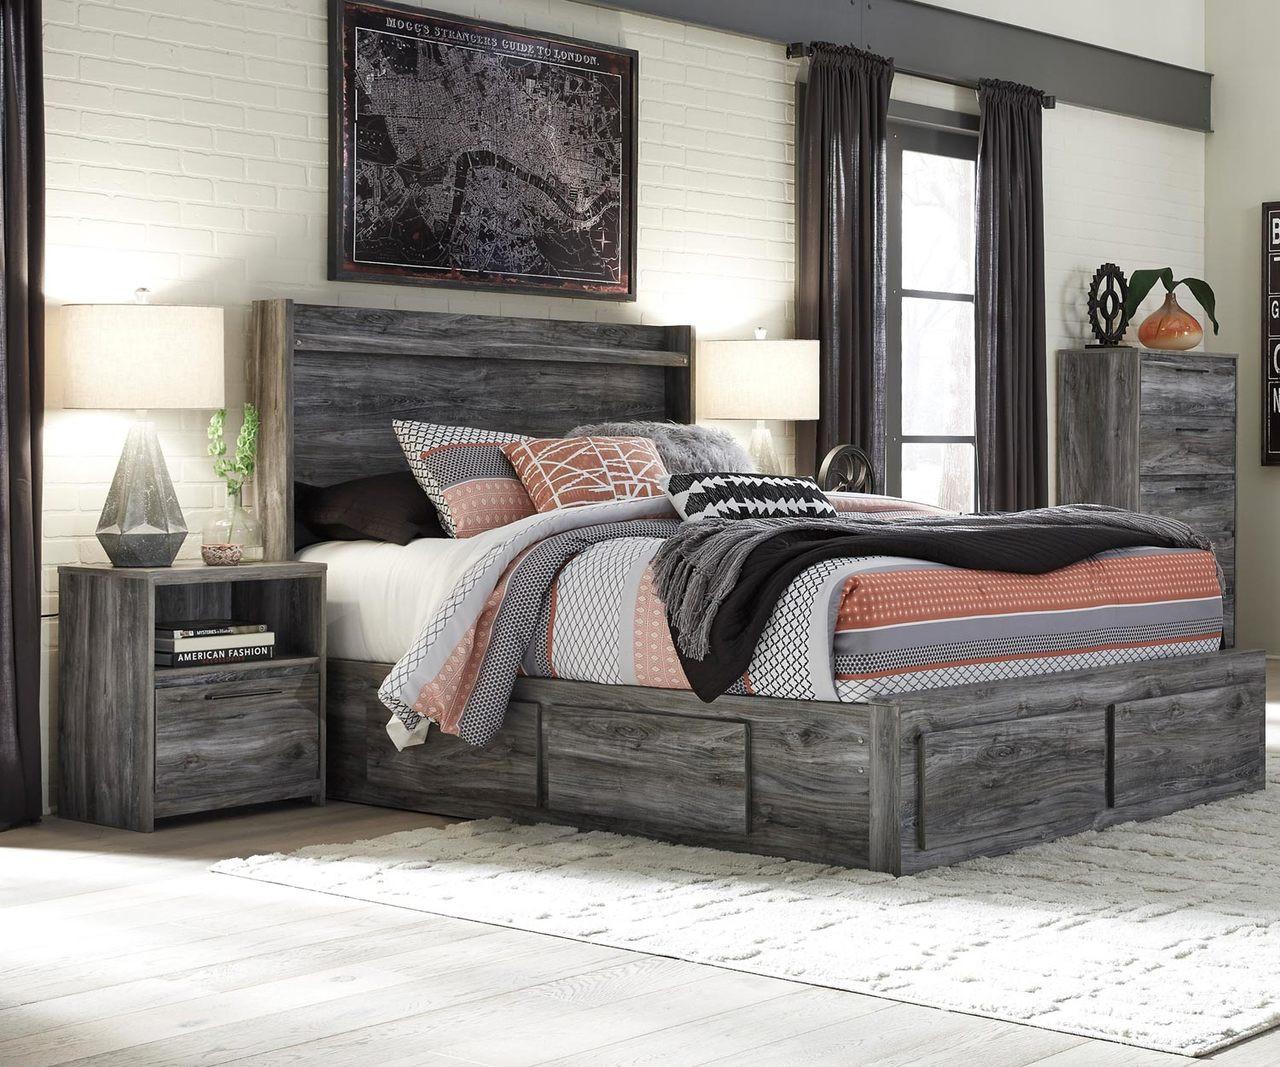 Image of: Baystorm Full Size Storage Bed B221 Ashley Kids Furniture Kids Teens Bedroom Furniture